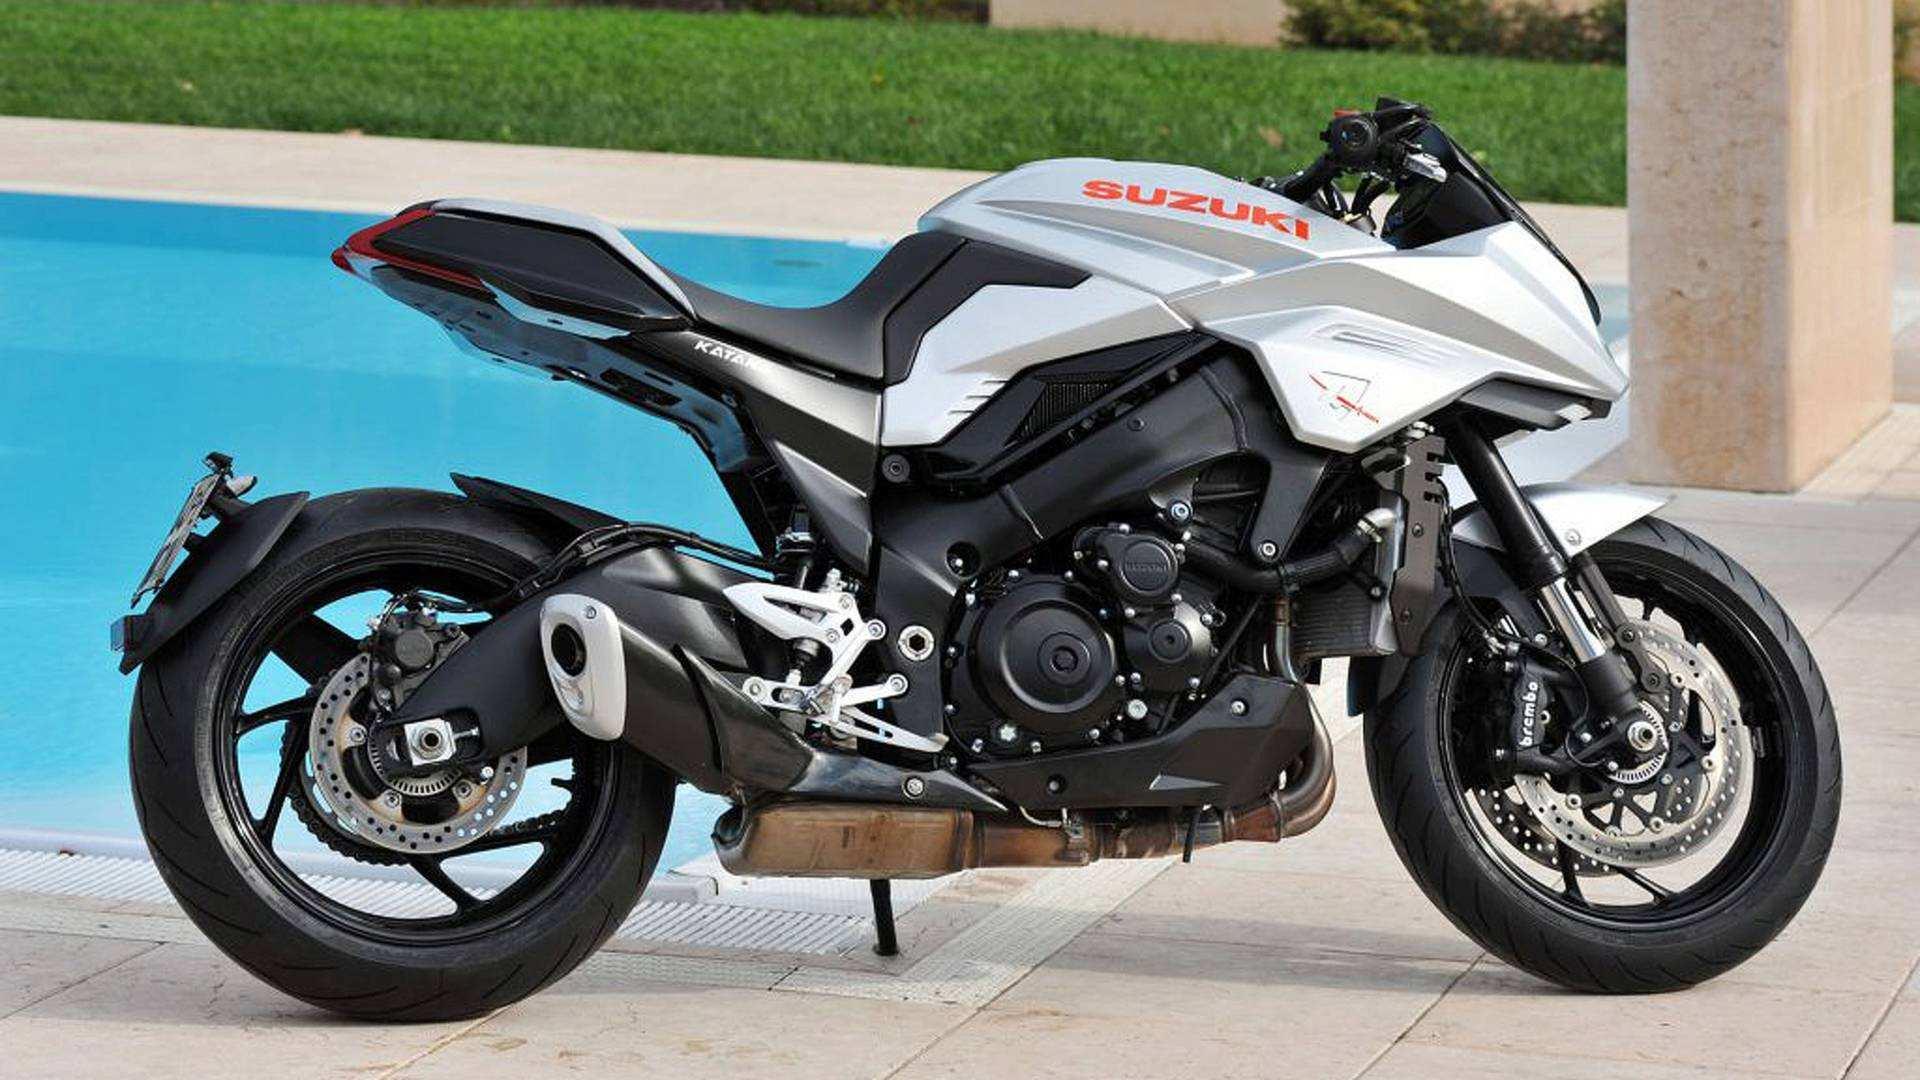 82 New 2019 Suzuki Katana Specs with 2019 Suzuki Katana